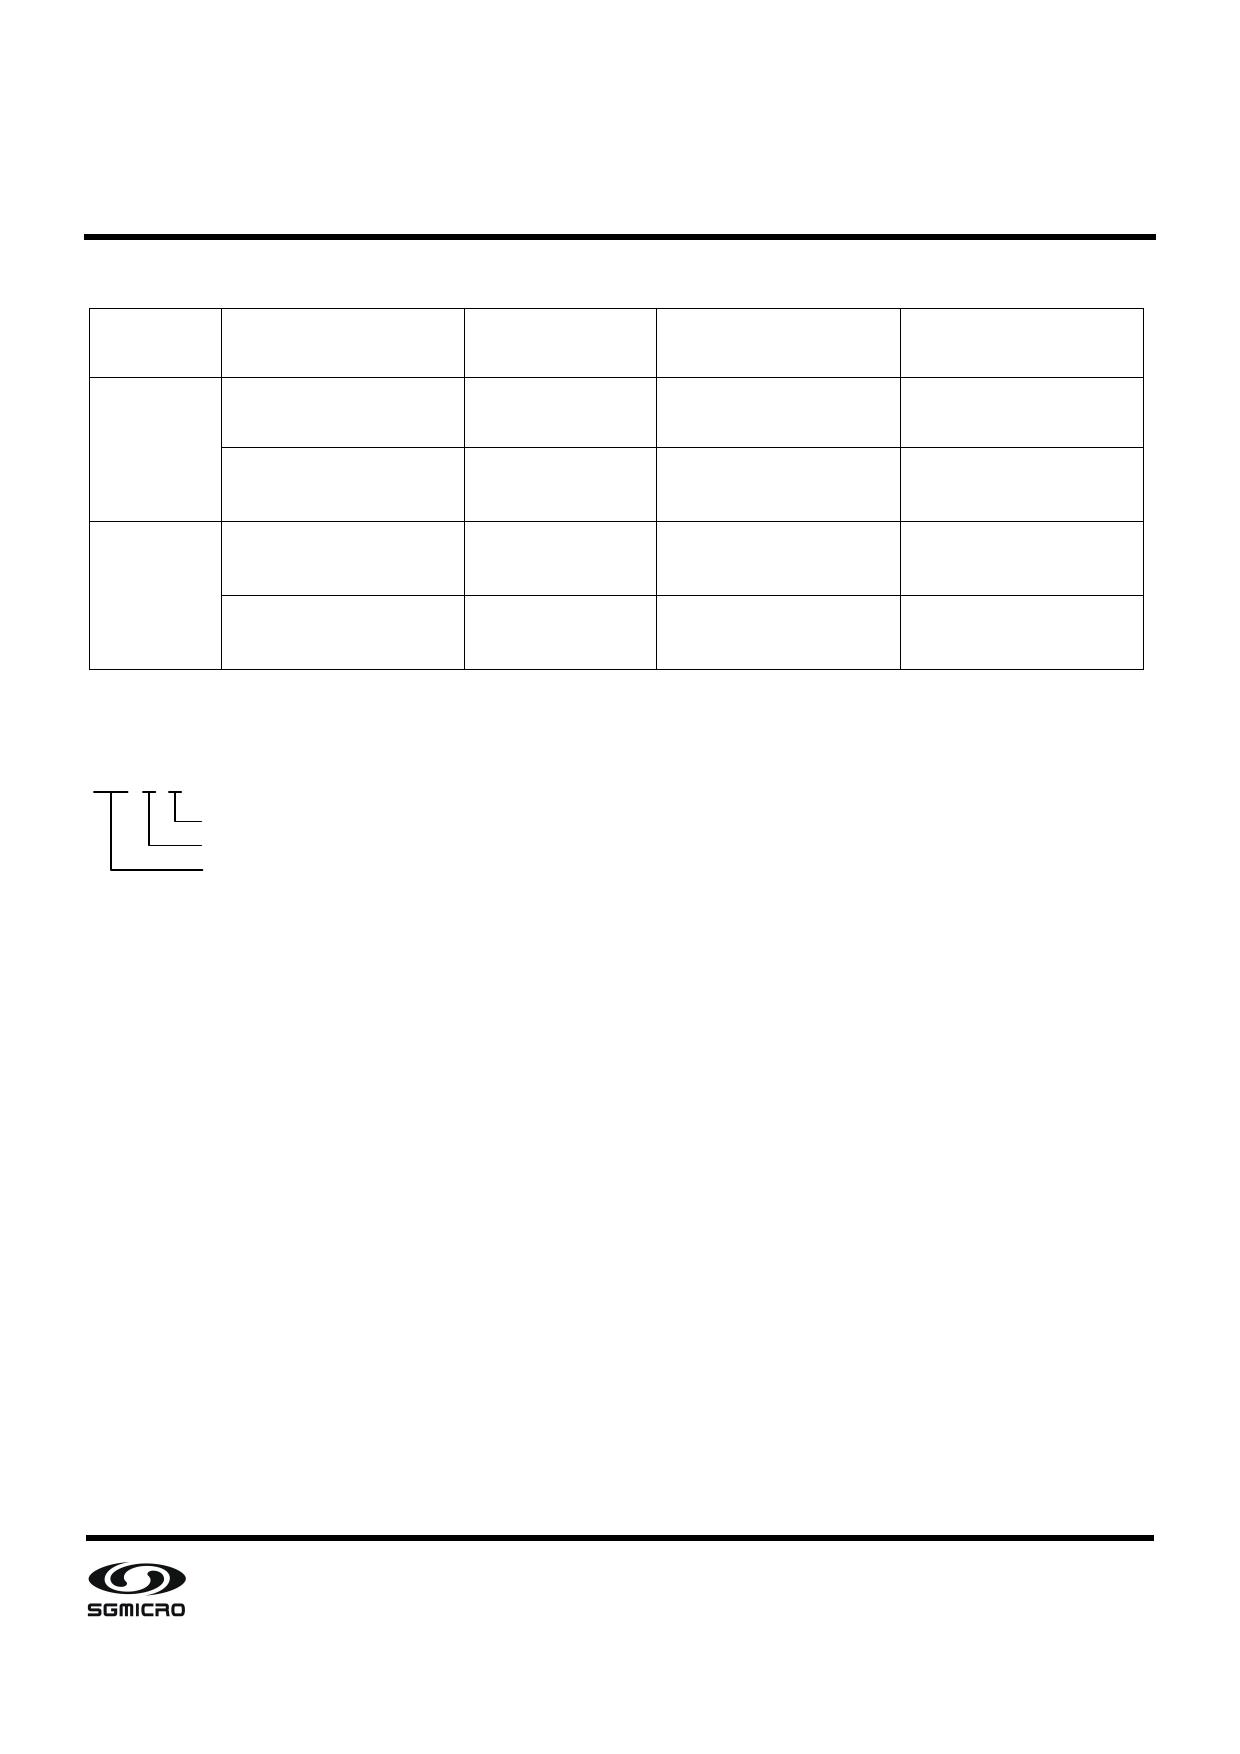 SGM8941 pdf, schematic